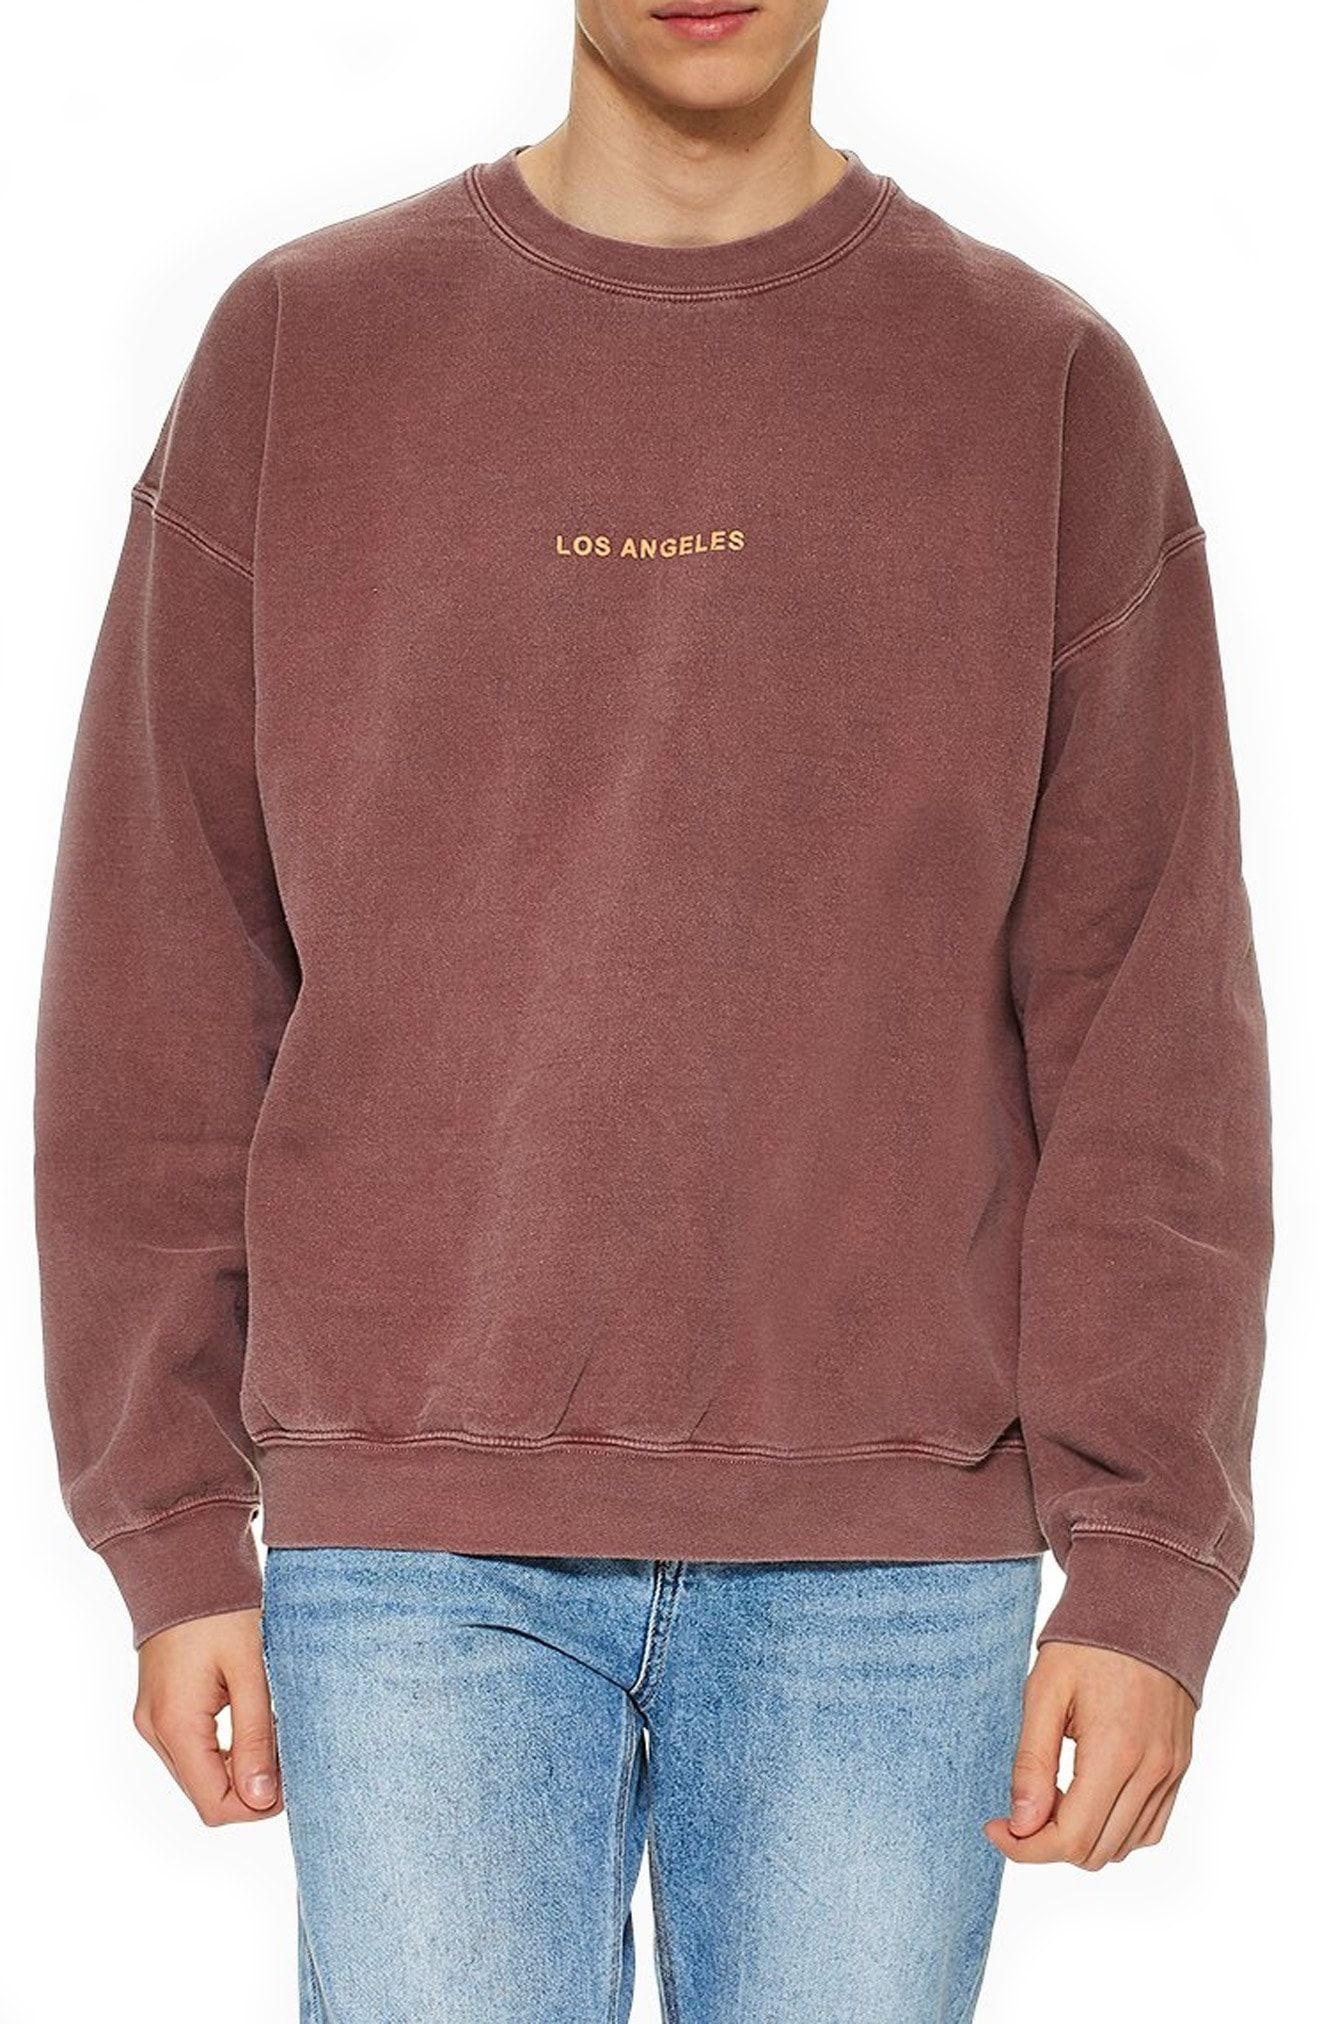 Topman Los Angeles Oversize Sweatshirt Topman Cloth Vintage Crewneck Sweatshirt Oversized Sweatshirt Sweatshirts [ 2024 x 1320 Pixel ]